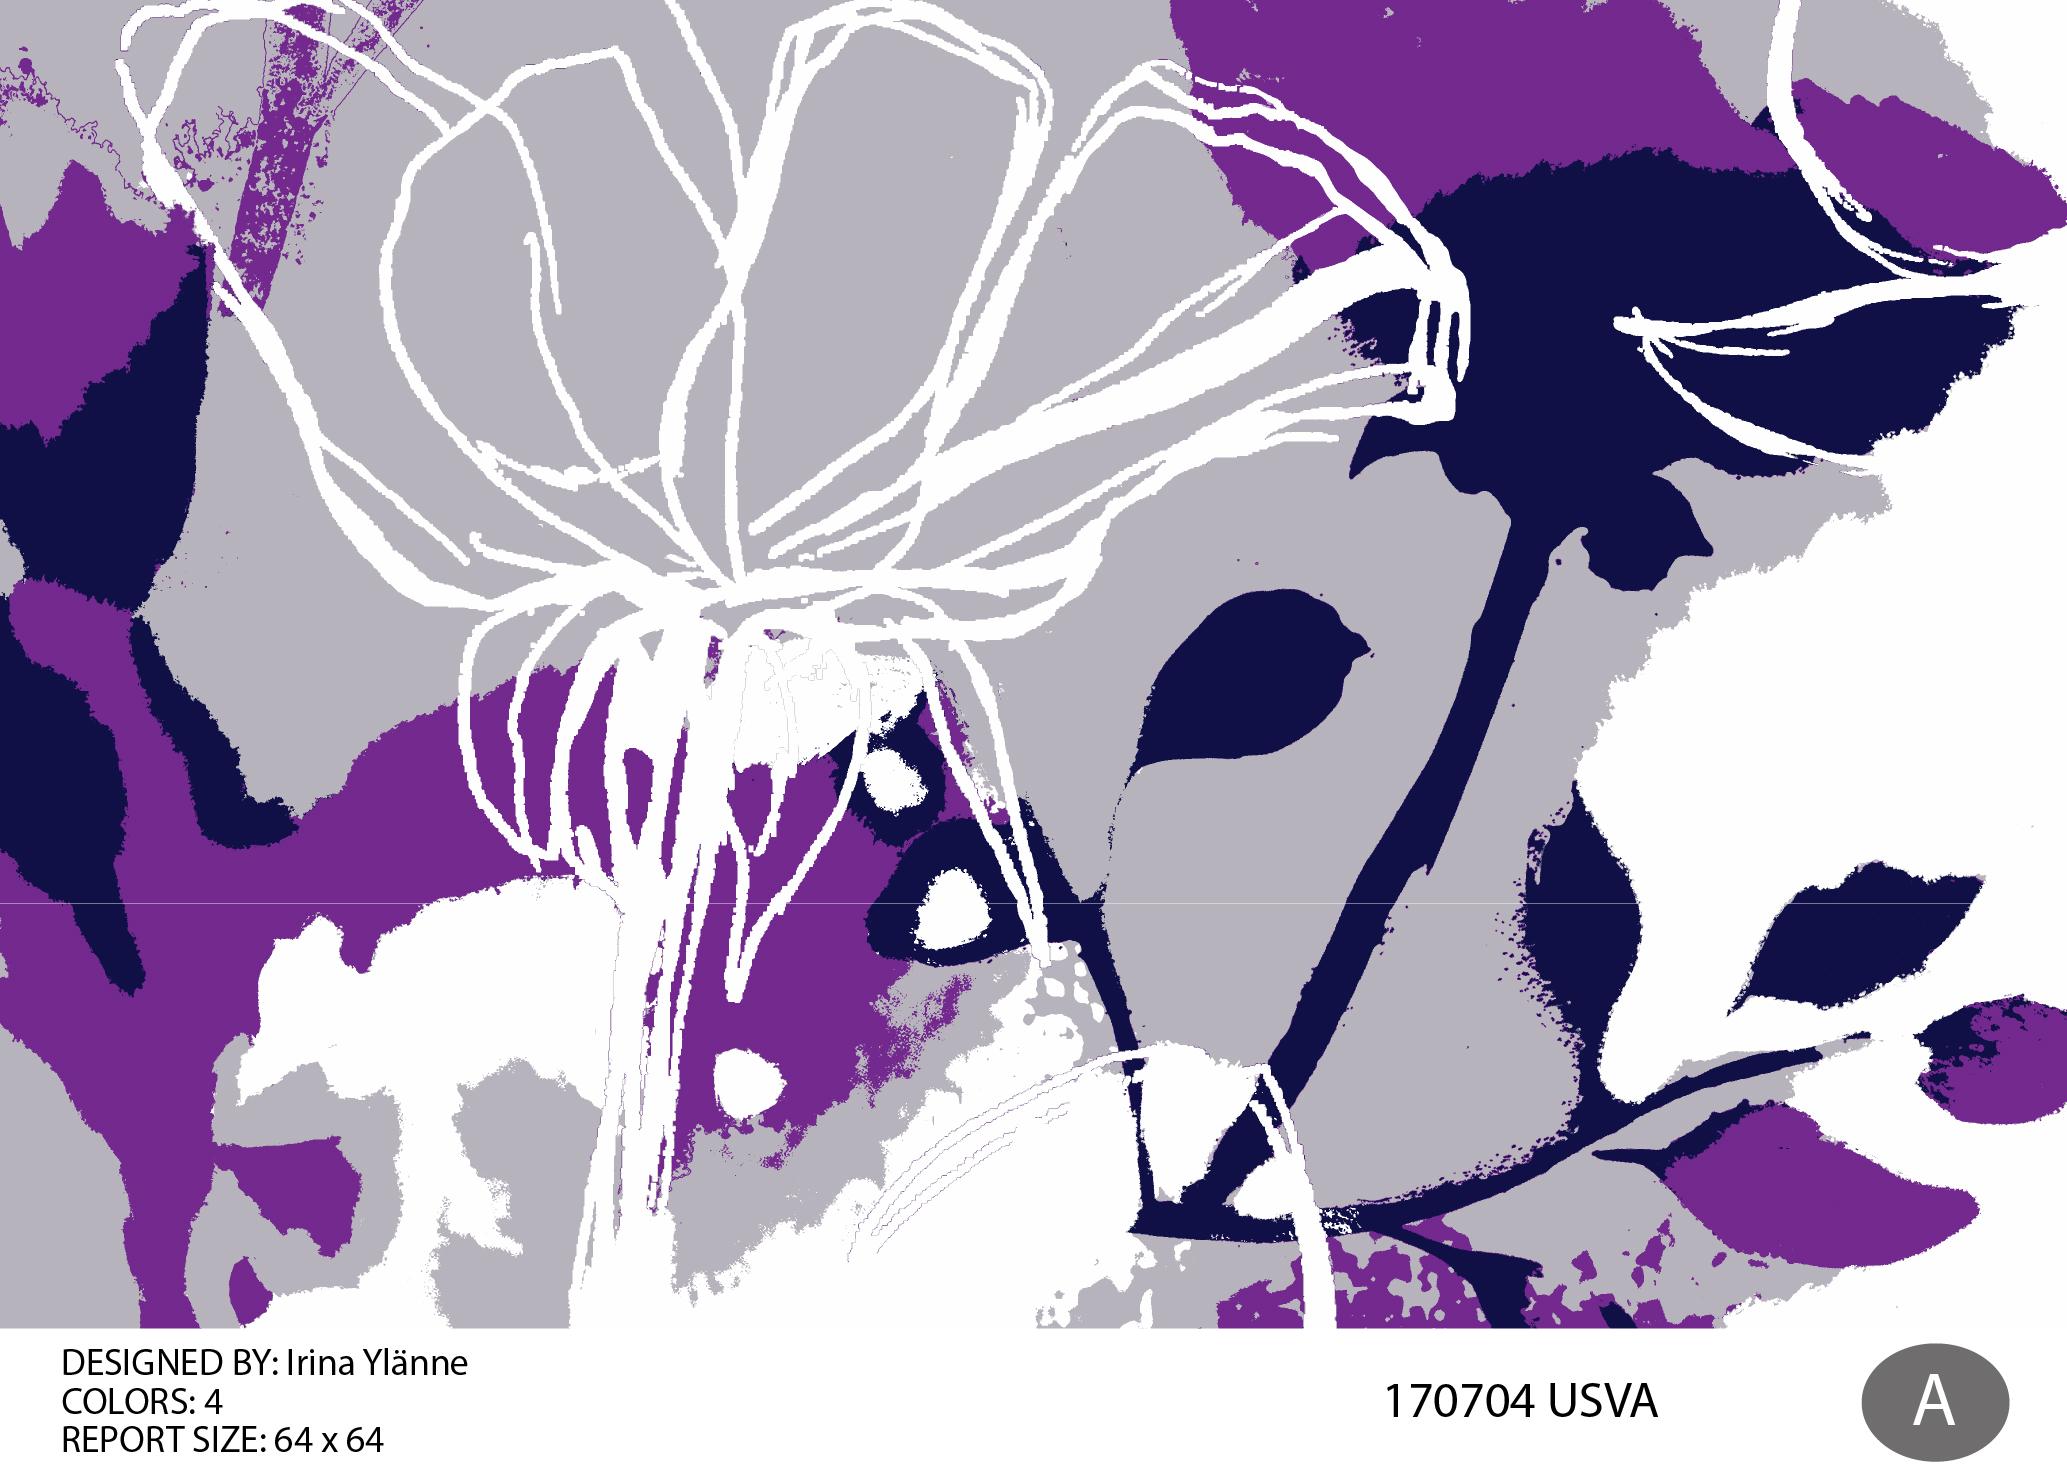 irina_usva 170704_colours4-01